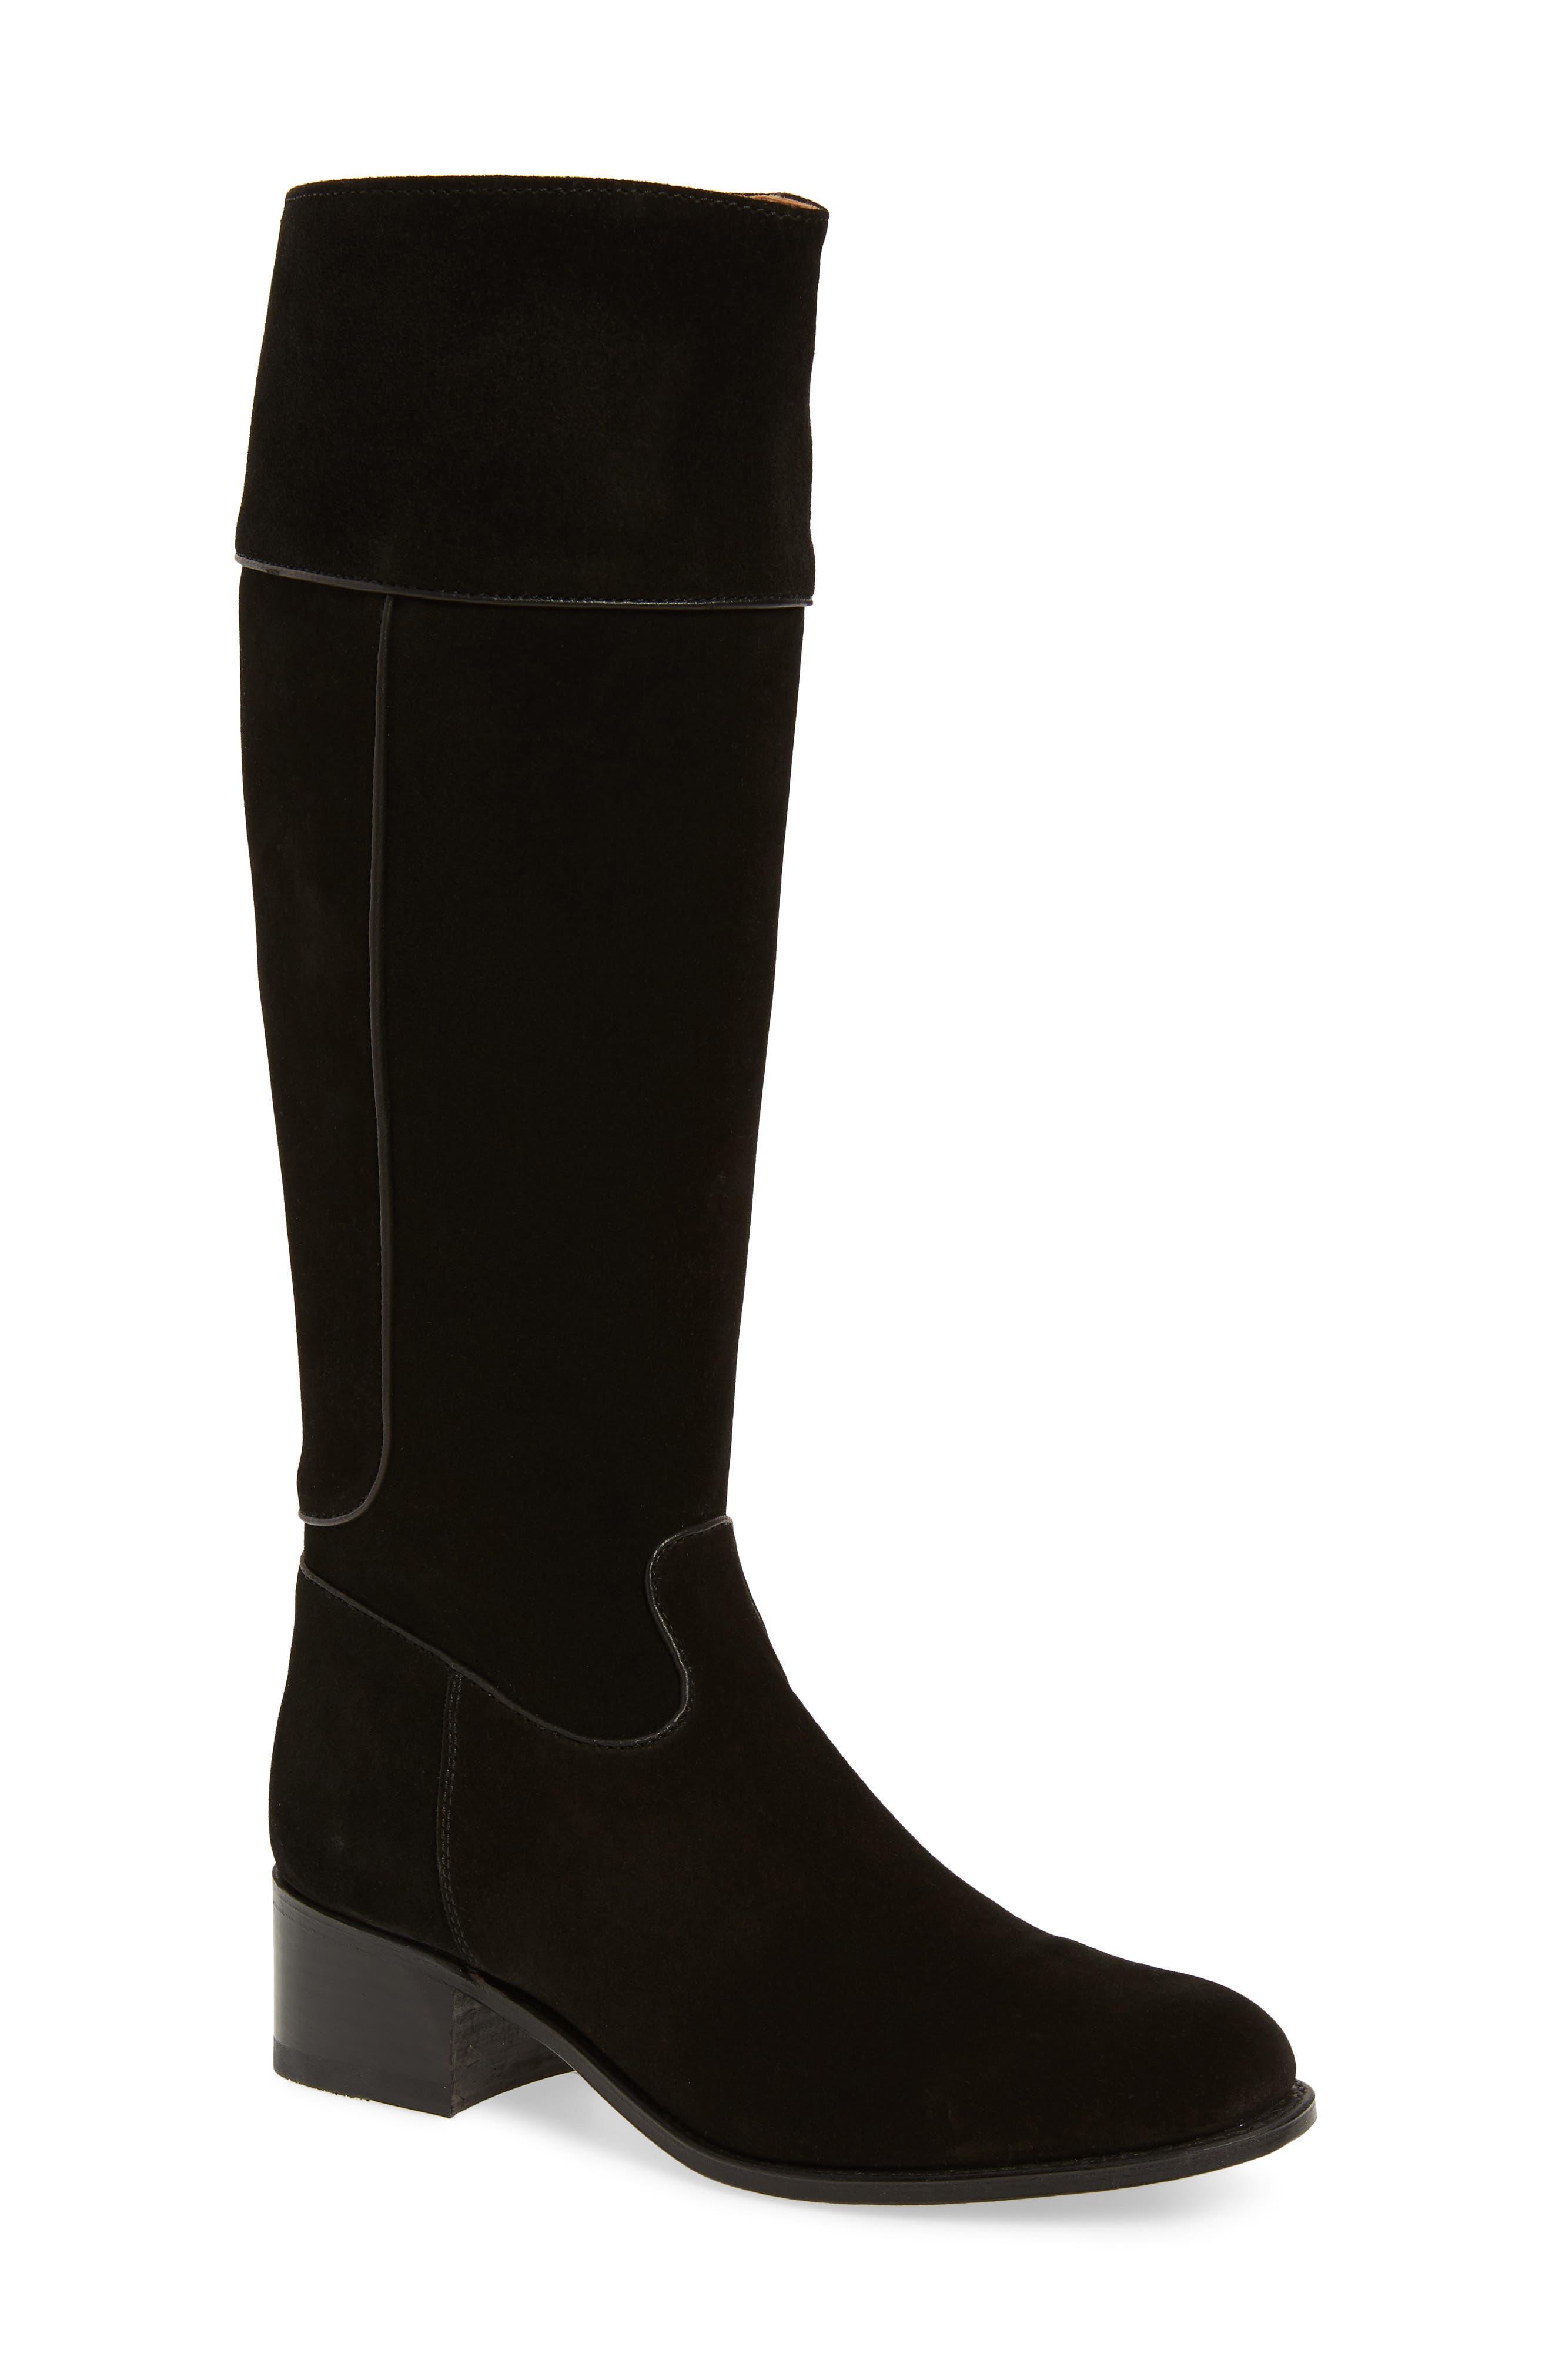 Alternate Image 1 Selected - Ariat Barcelona Boot (Women)